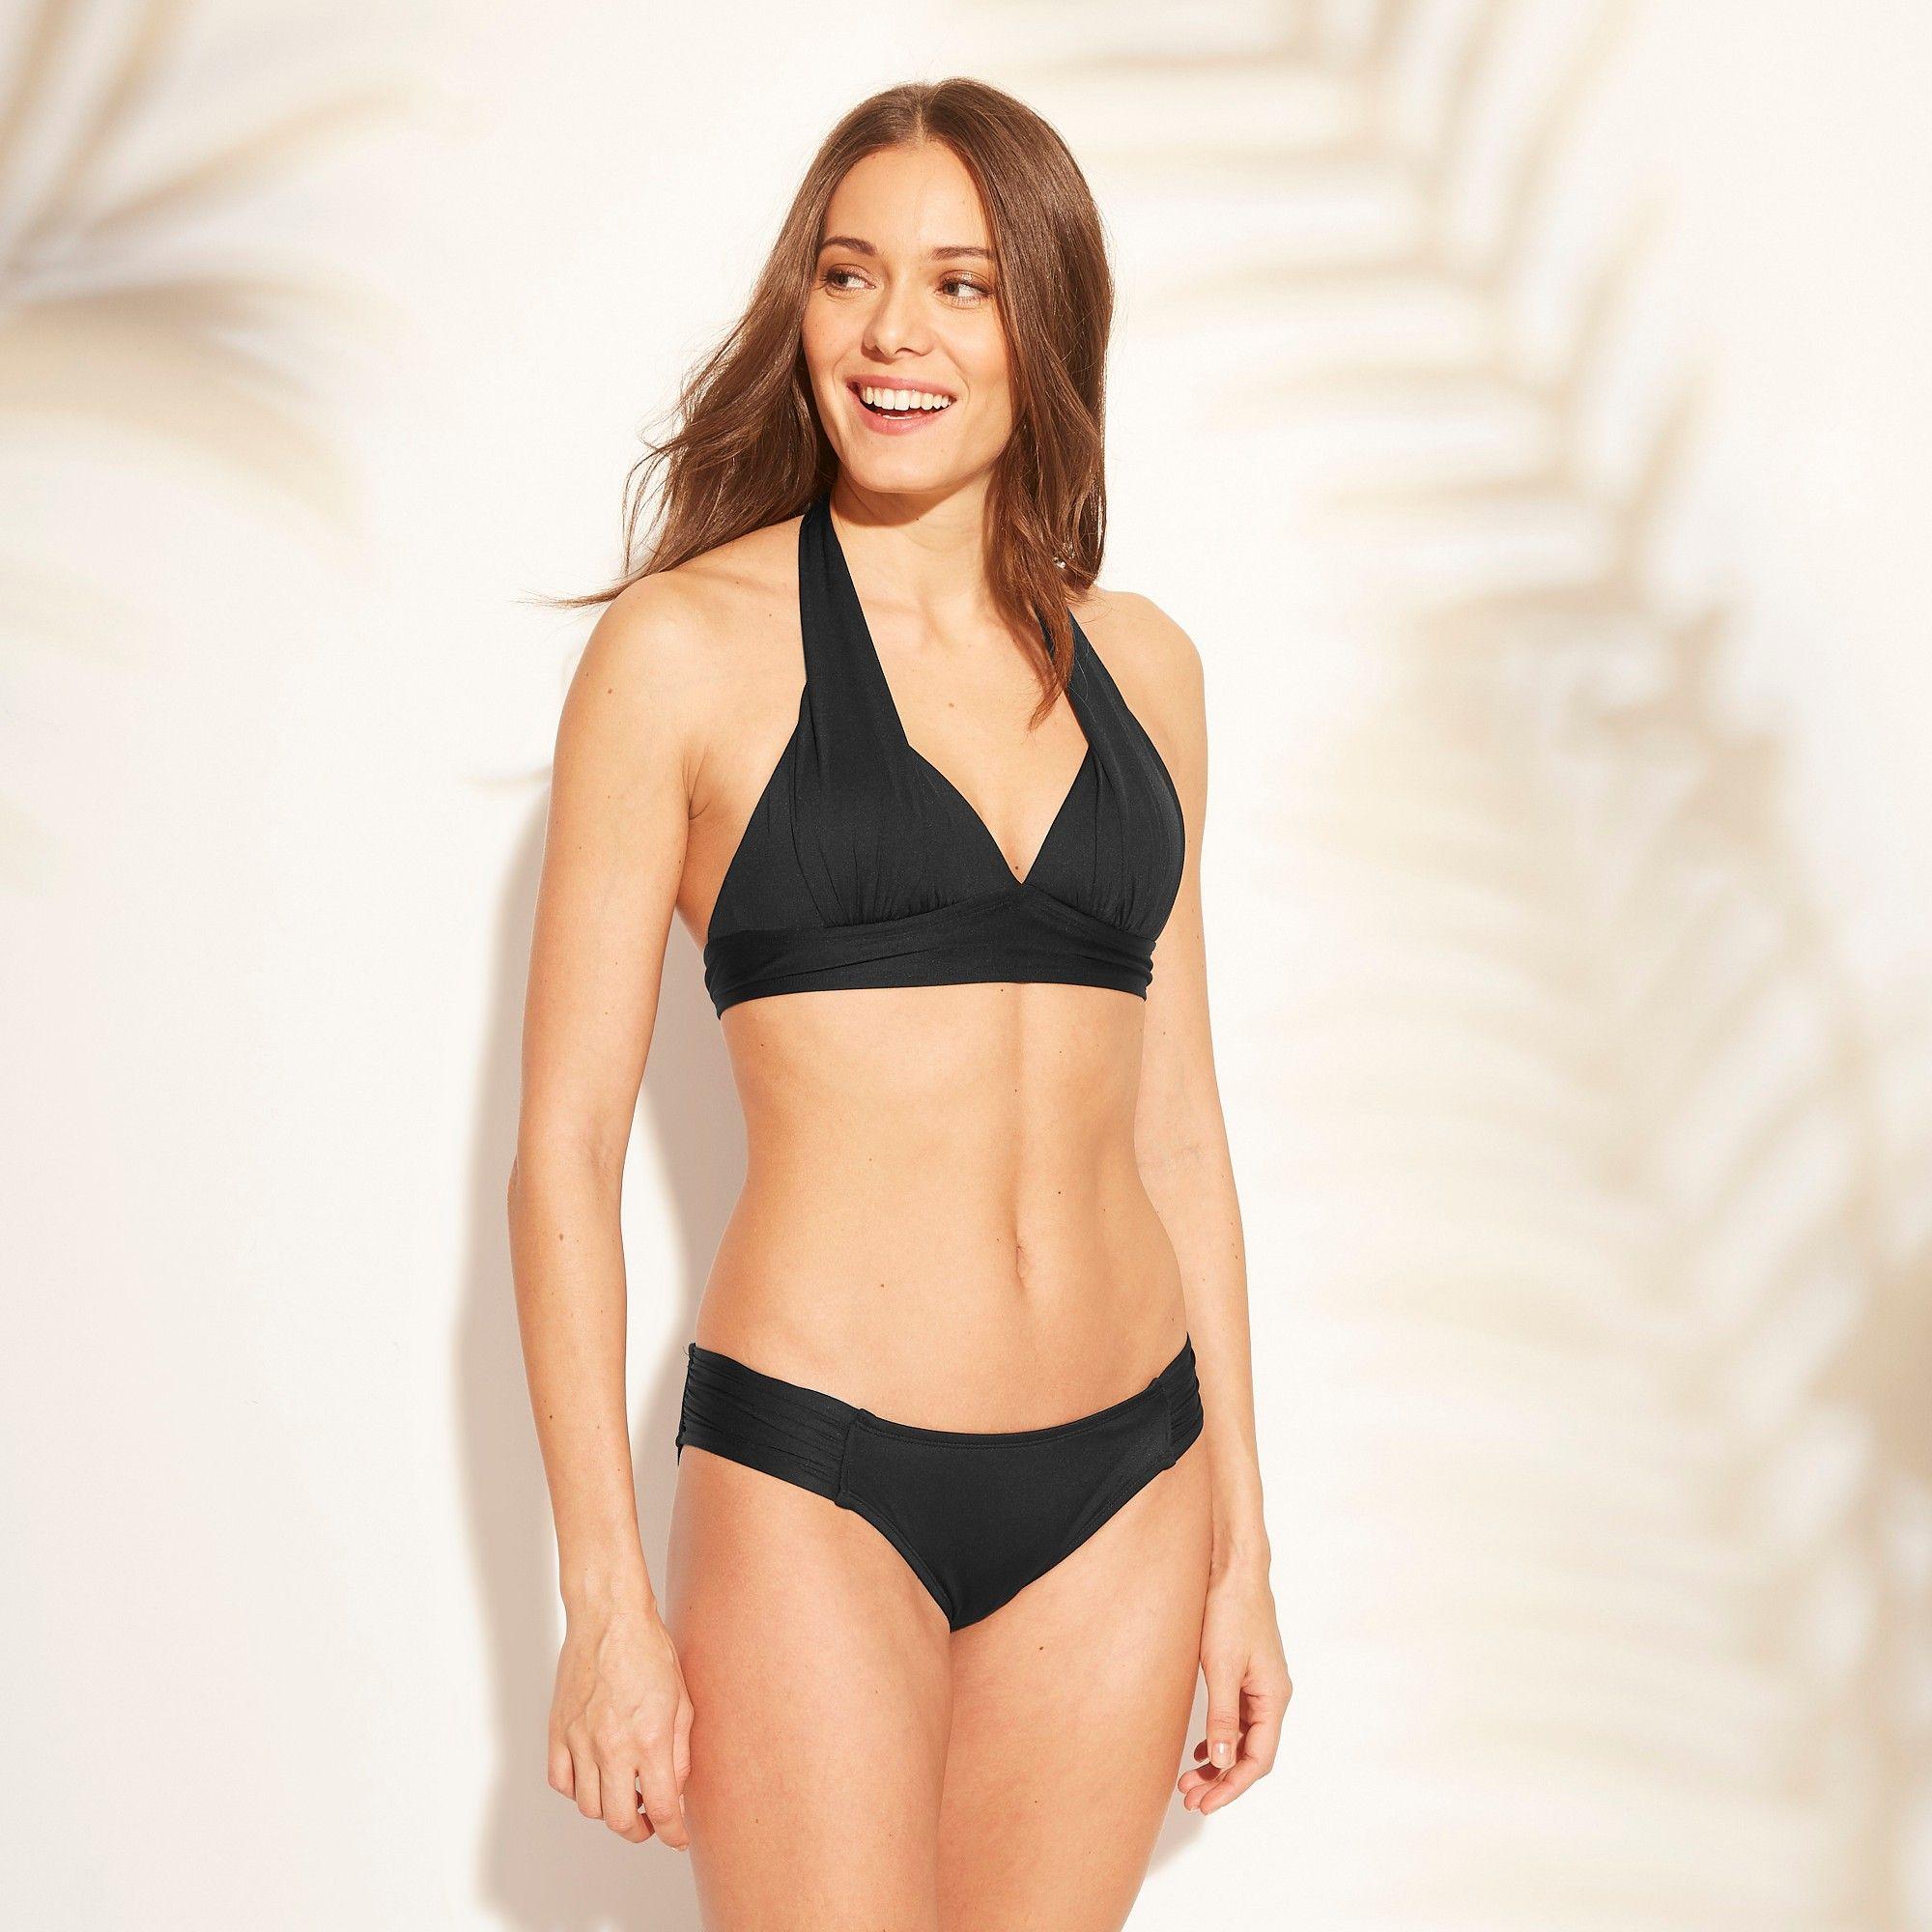 beb613d4d0 Women s Halter Bikini Top - Kona Sol Black M